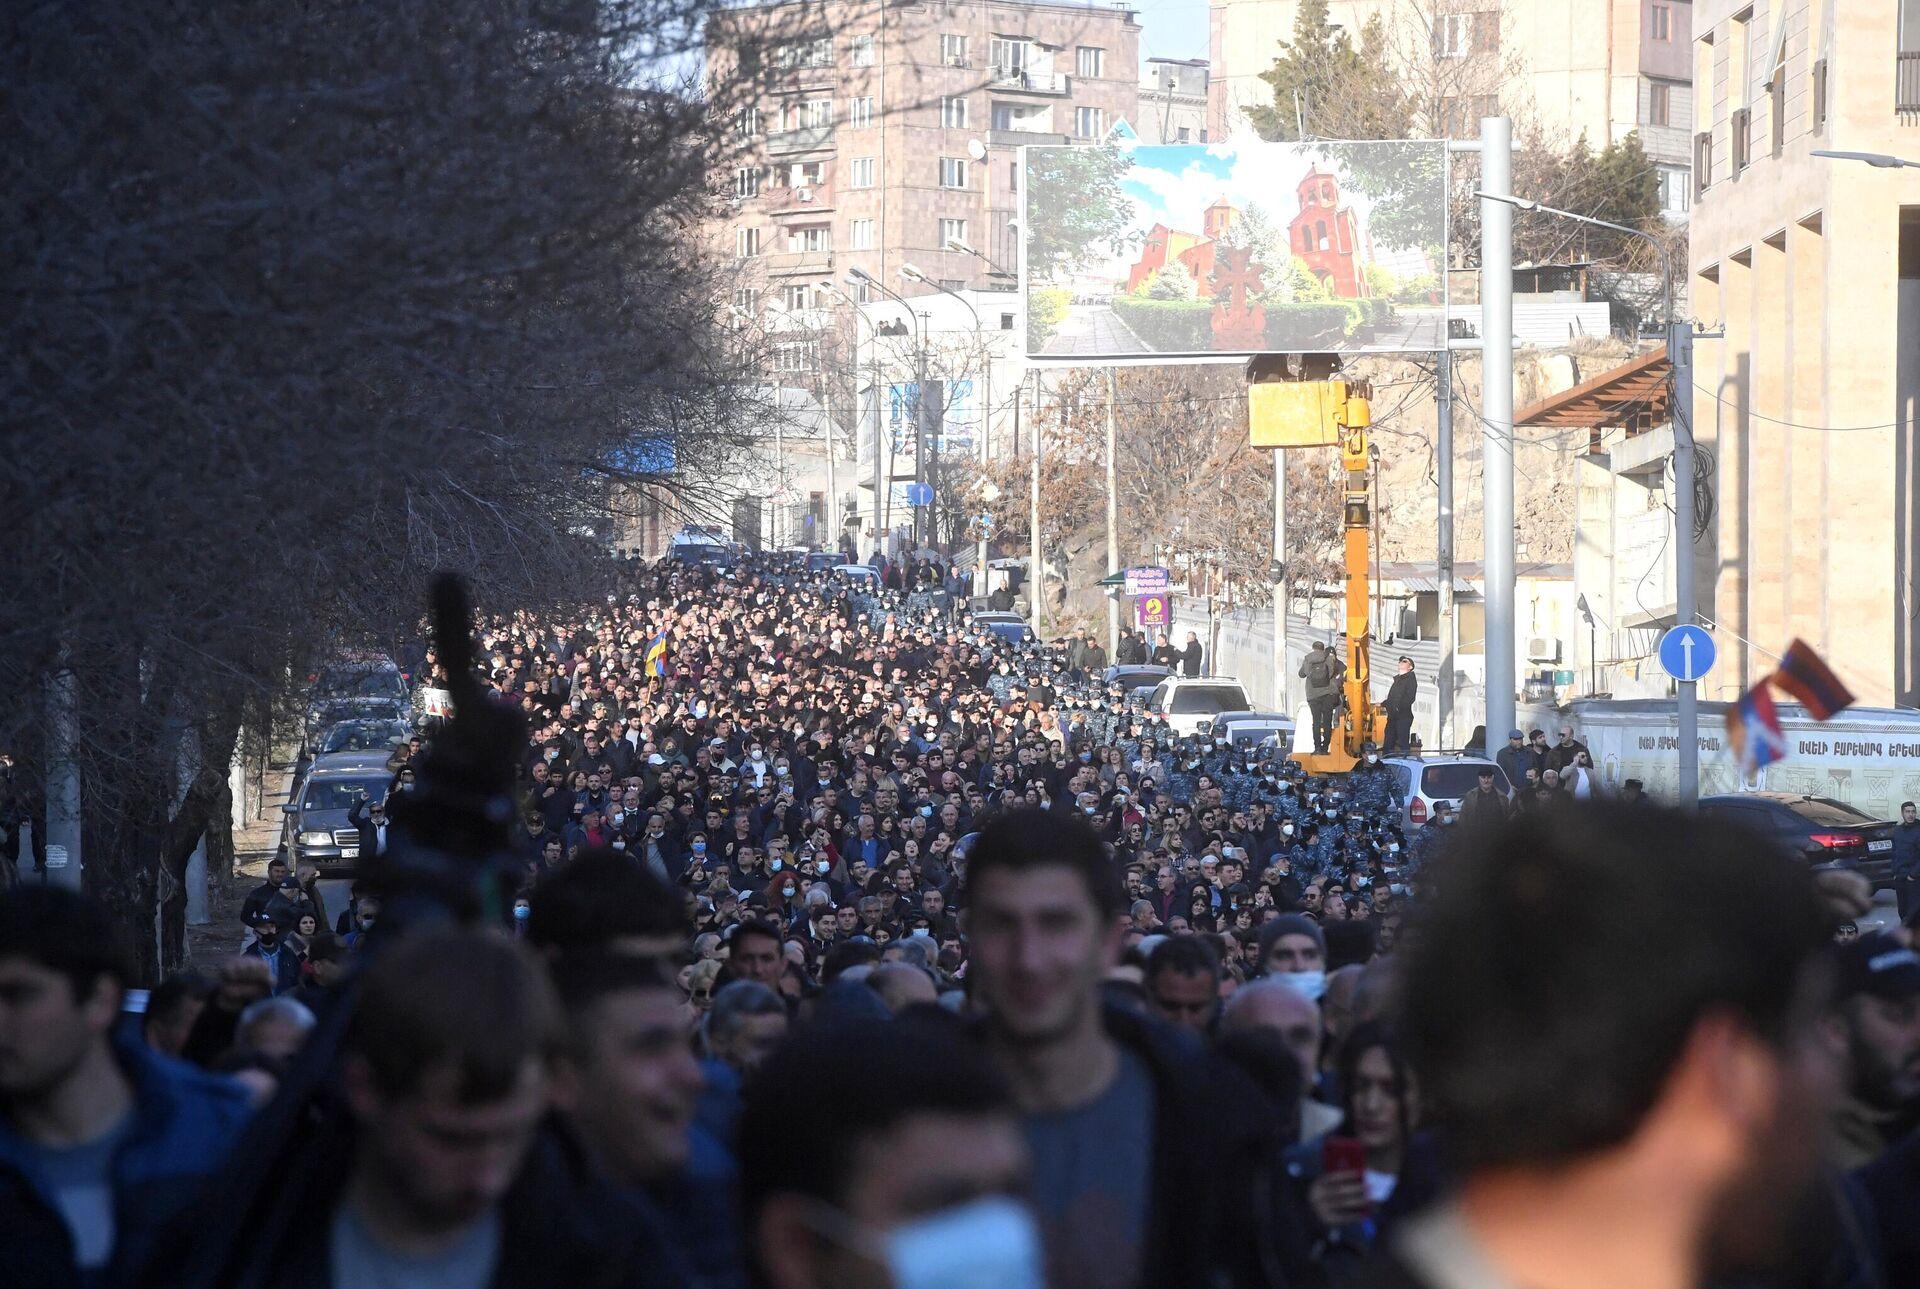 Участники митинга оппозиции в Ереване - РИА Новости, 1920, 06.04.2021